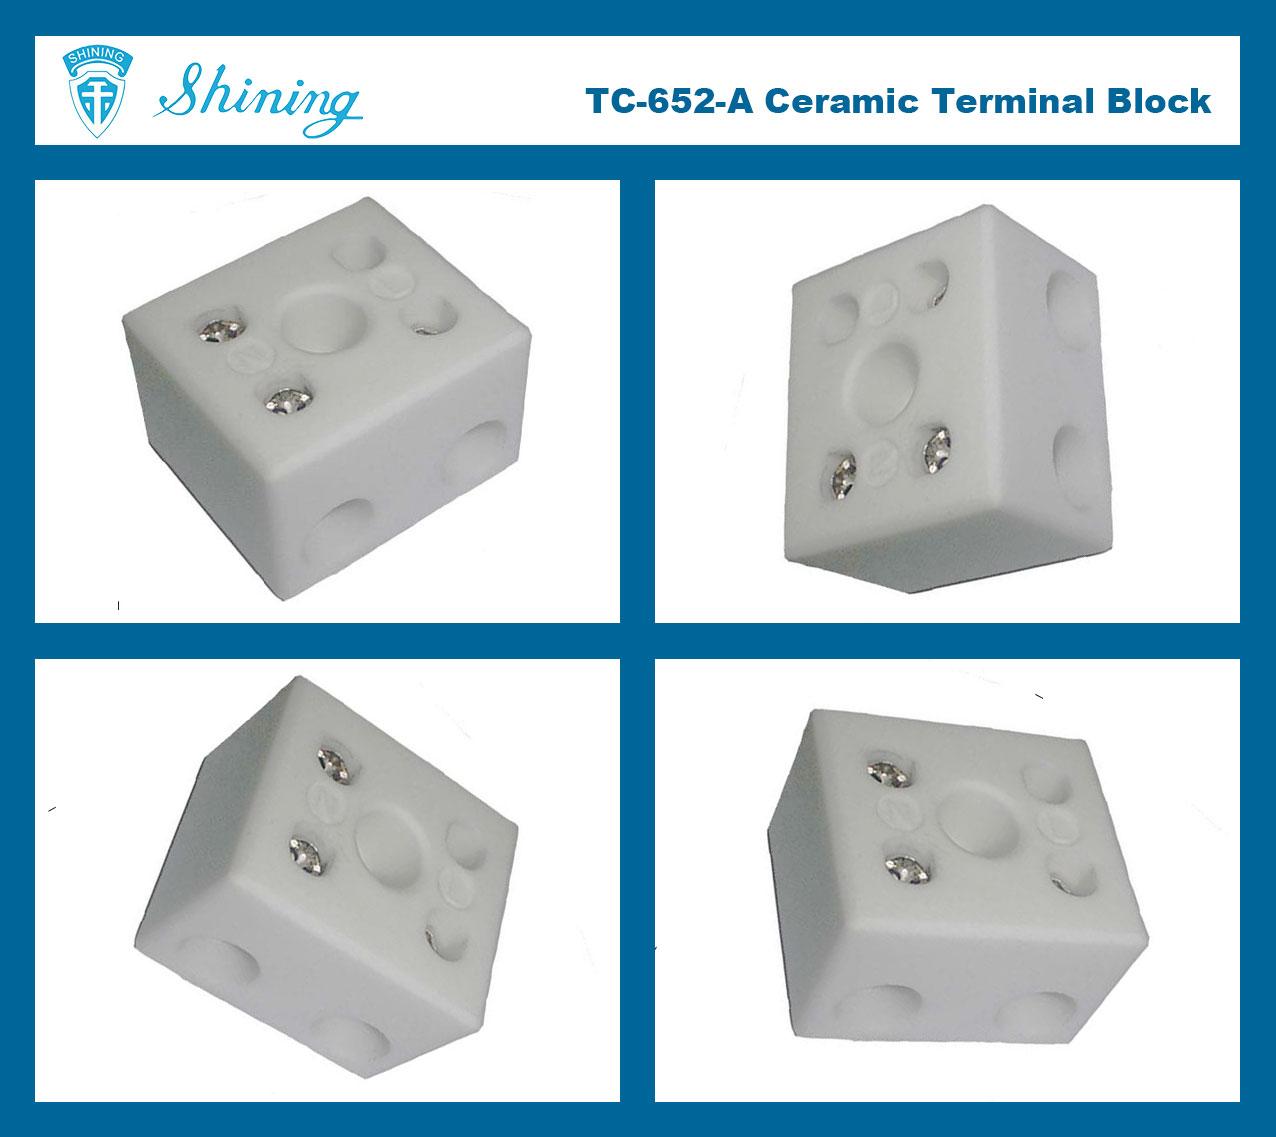 TC-652-A Panel Mounted 600V 65A 2 Pole Ceramic Terminal Block